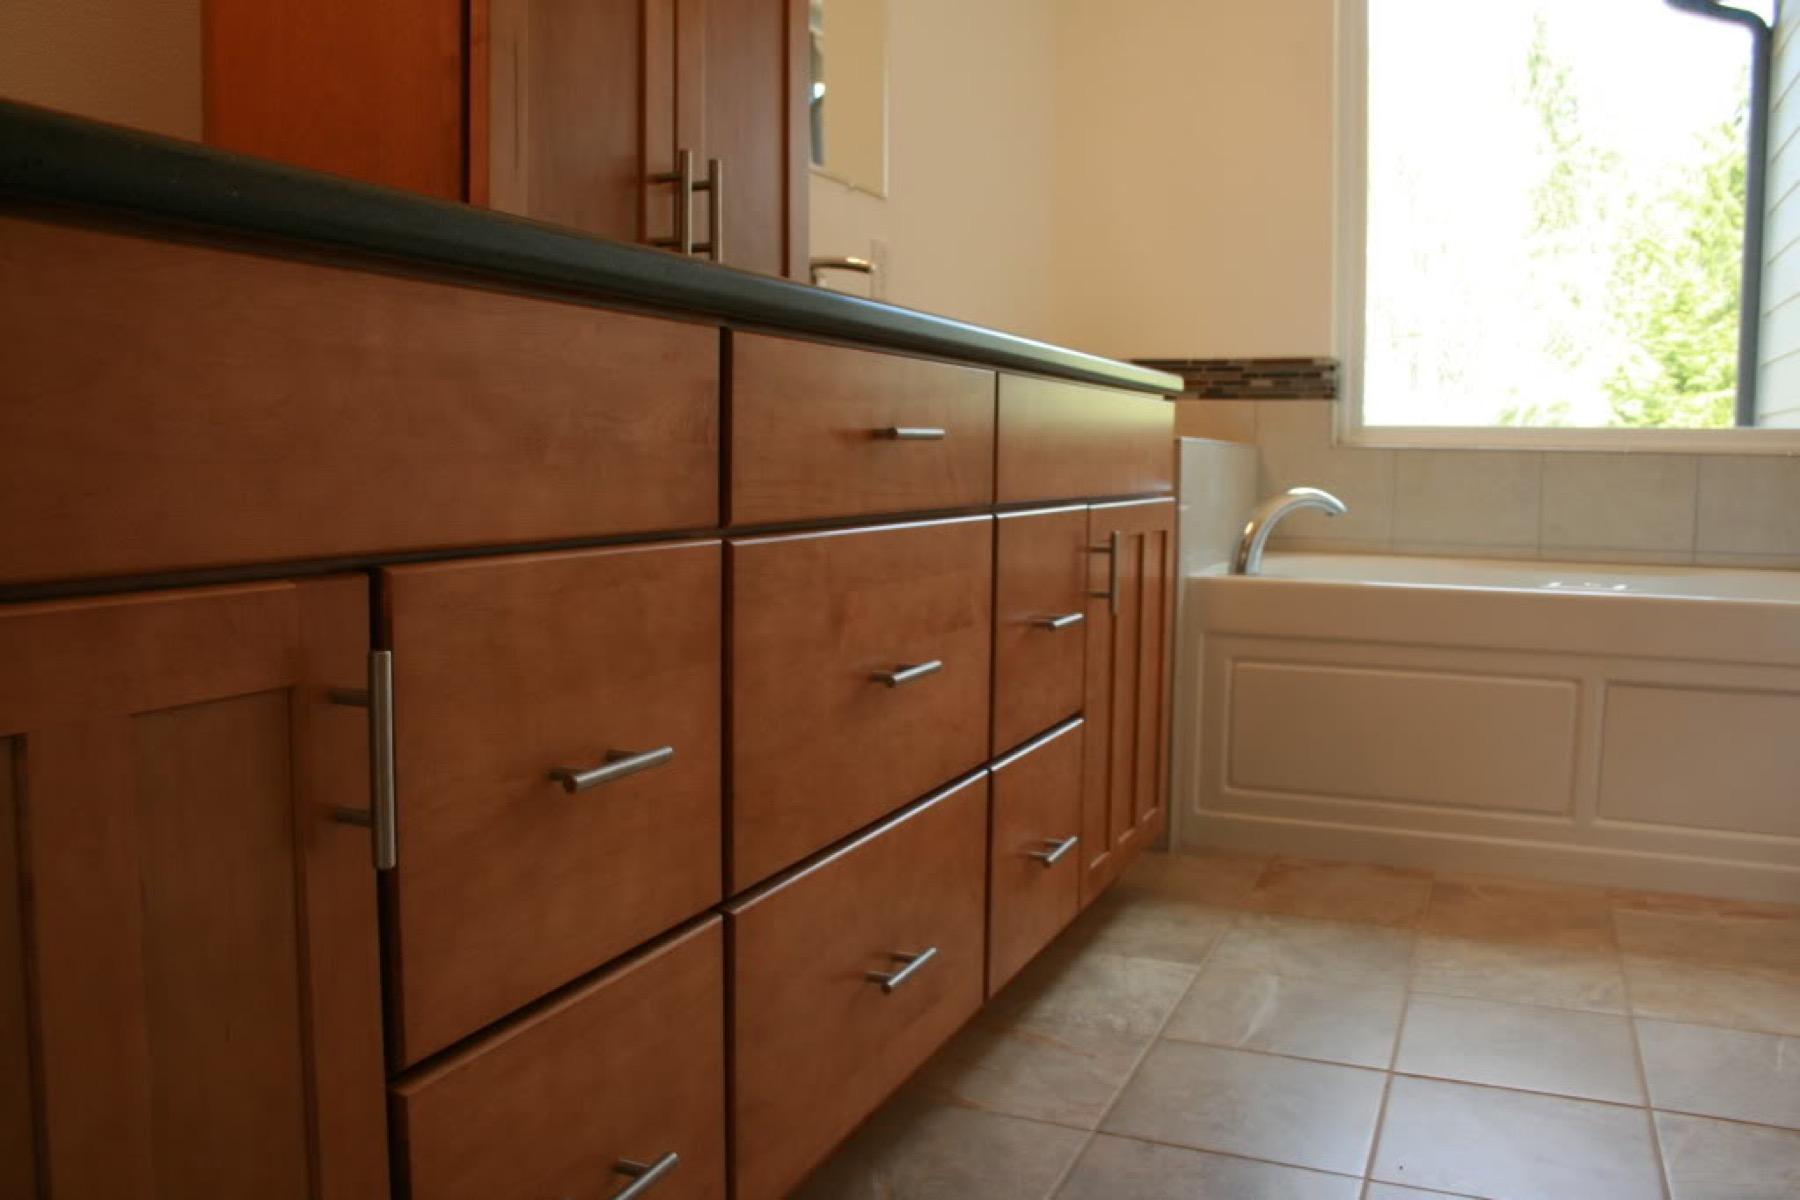 Kelley_Home_Services_Gig_Harbor_Home_Construction_16.jpg